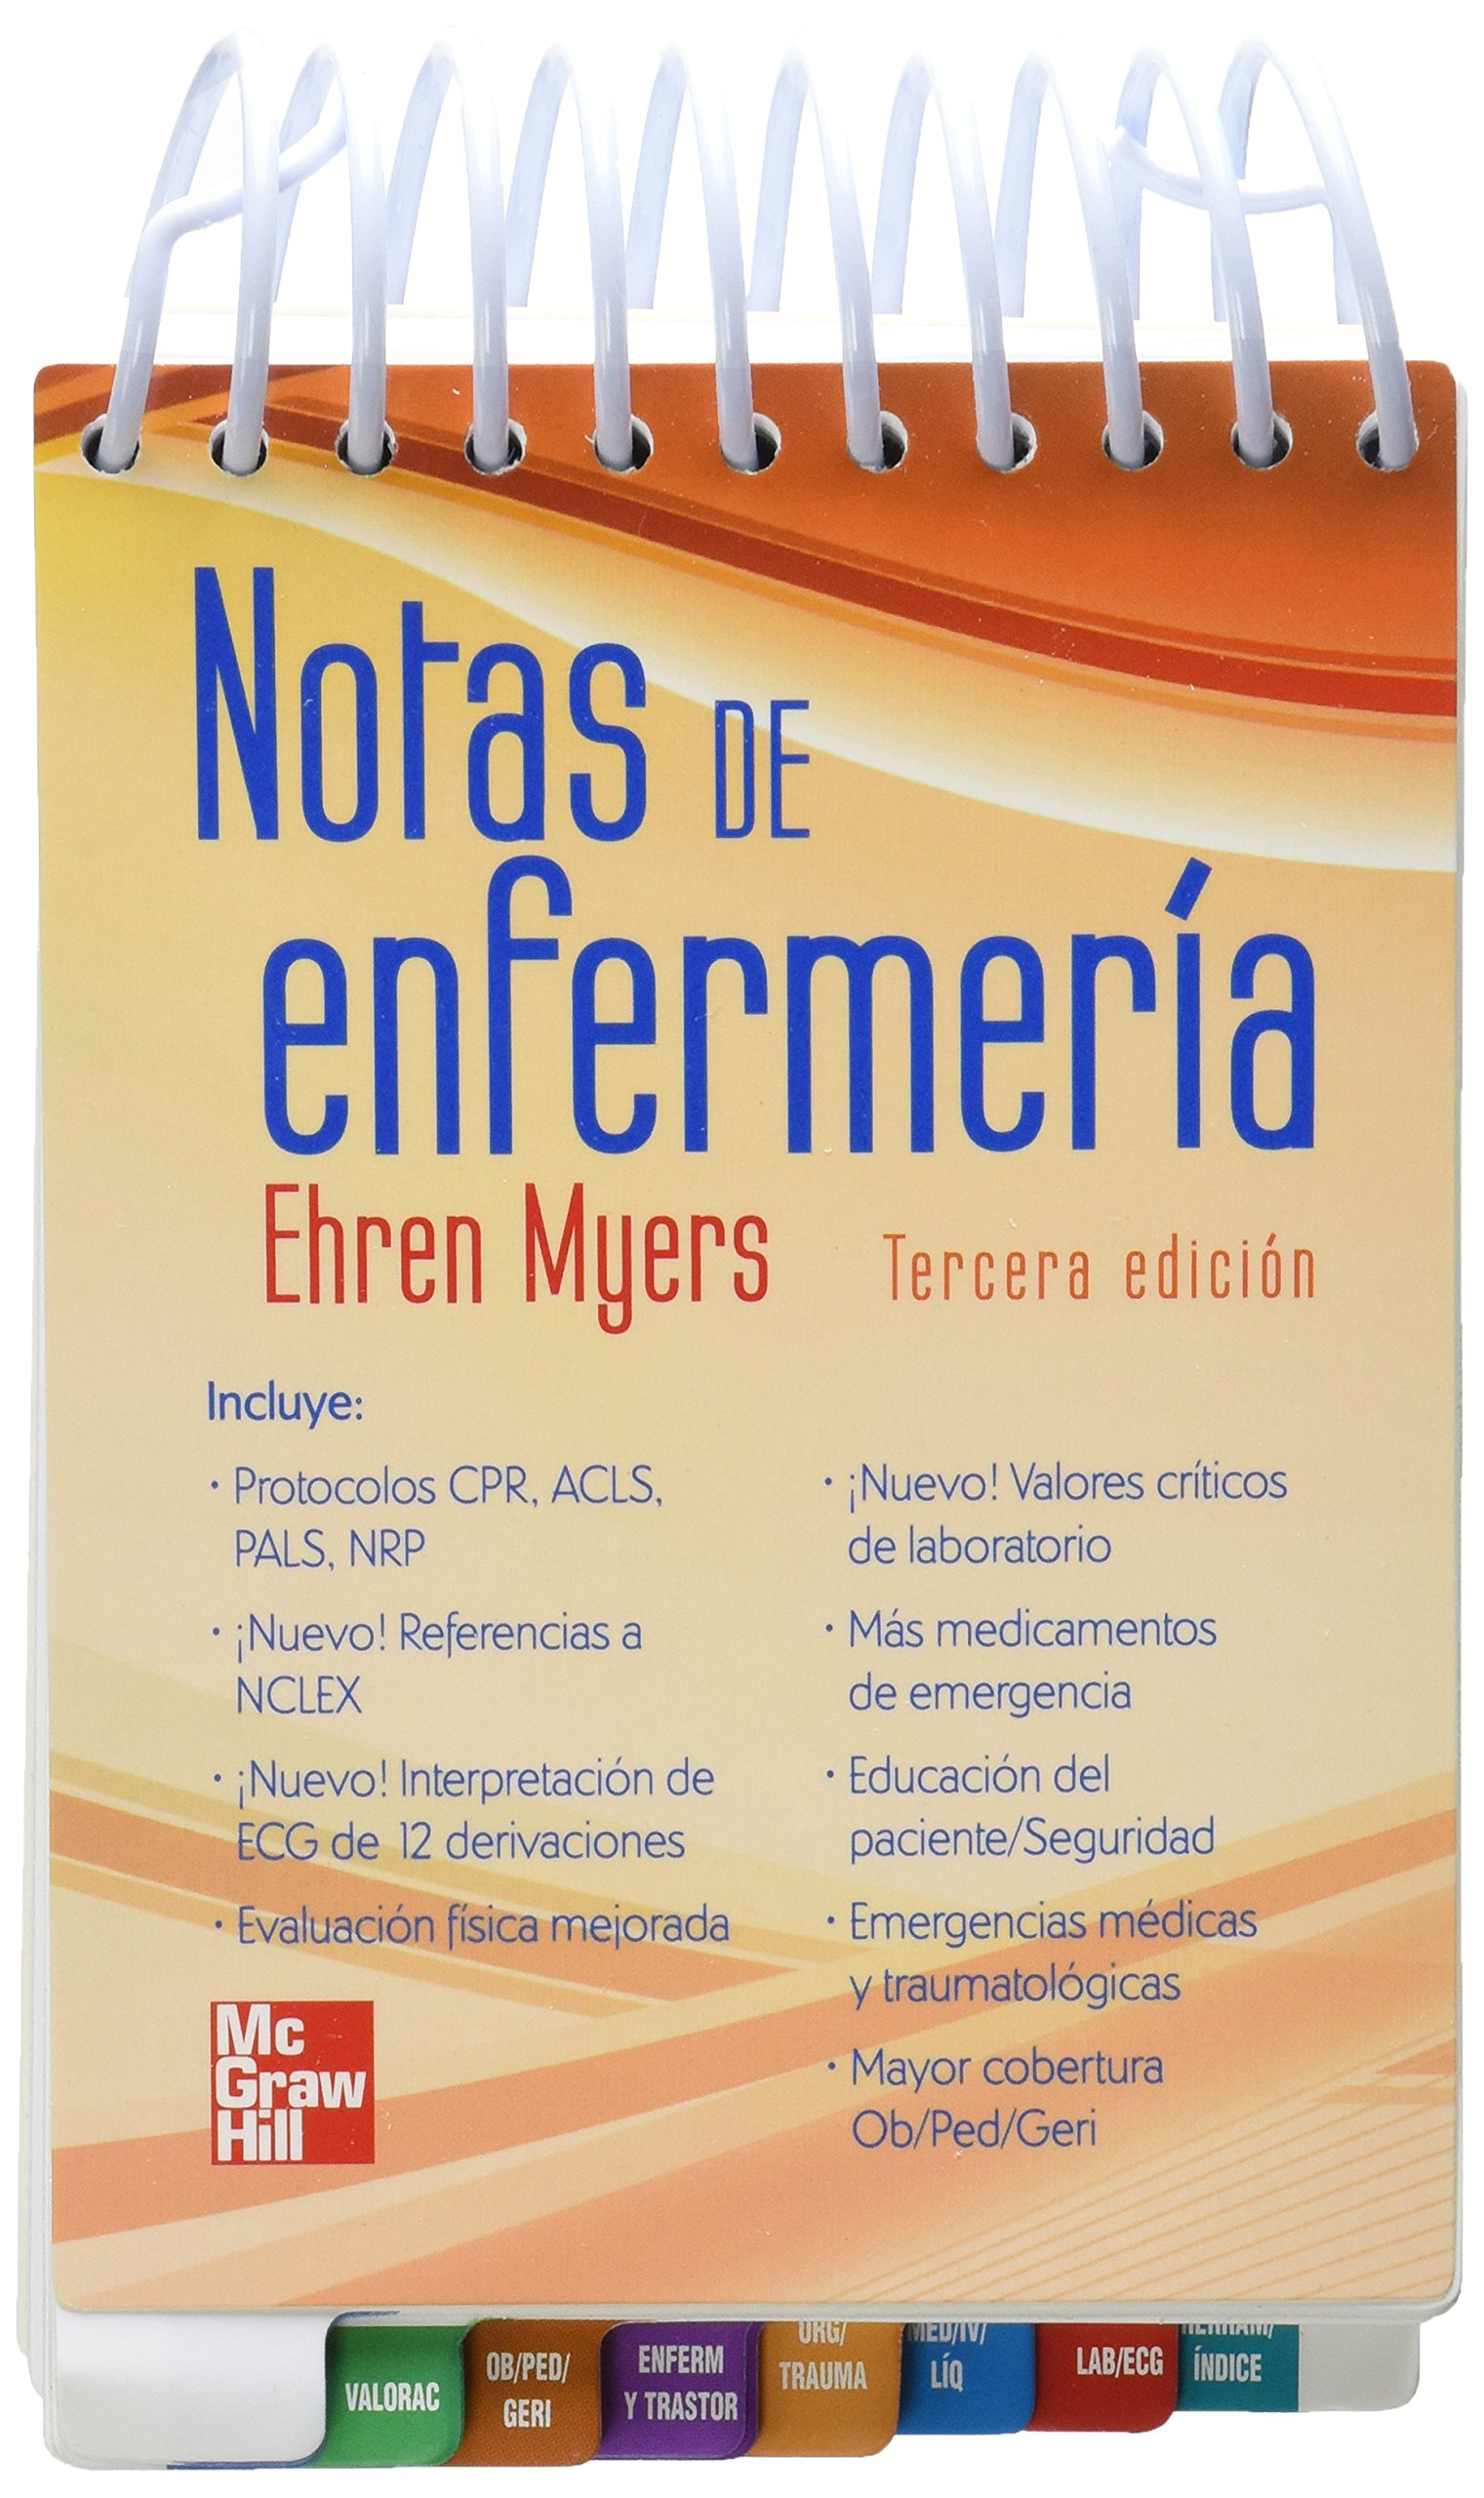 notas de enfermeria ehren myers